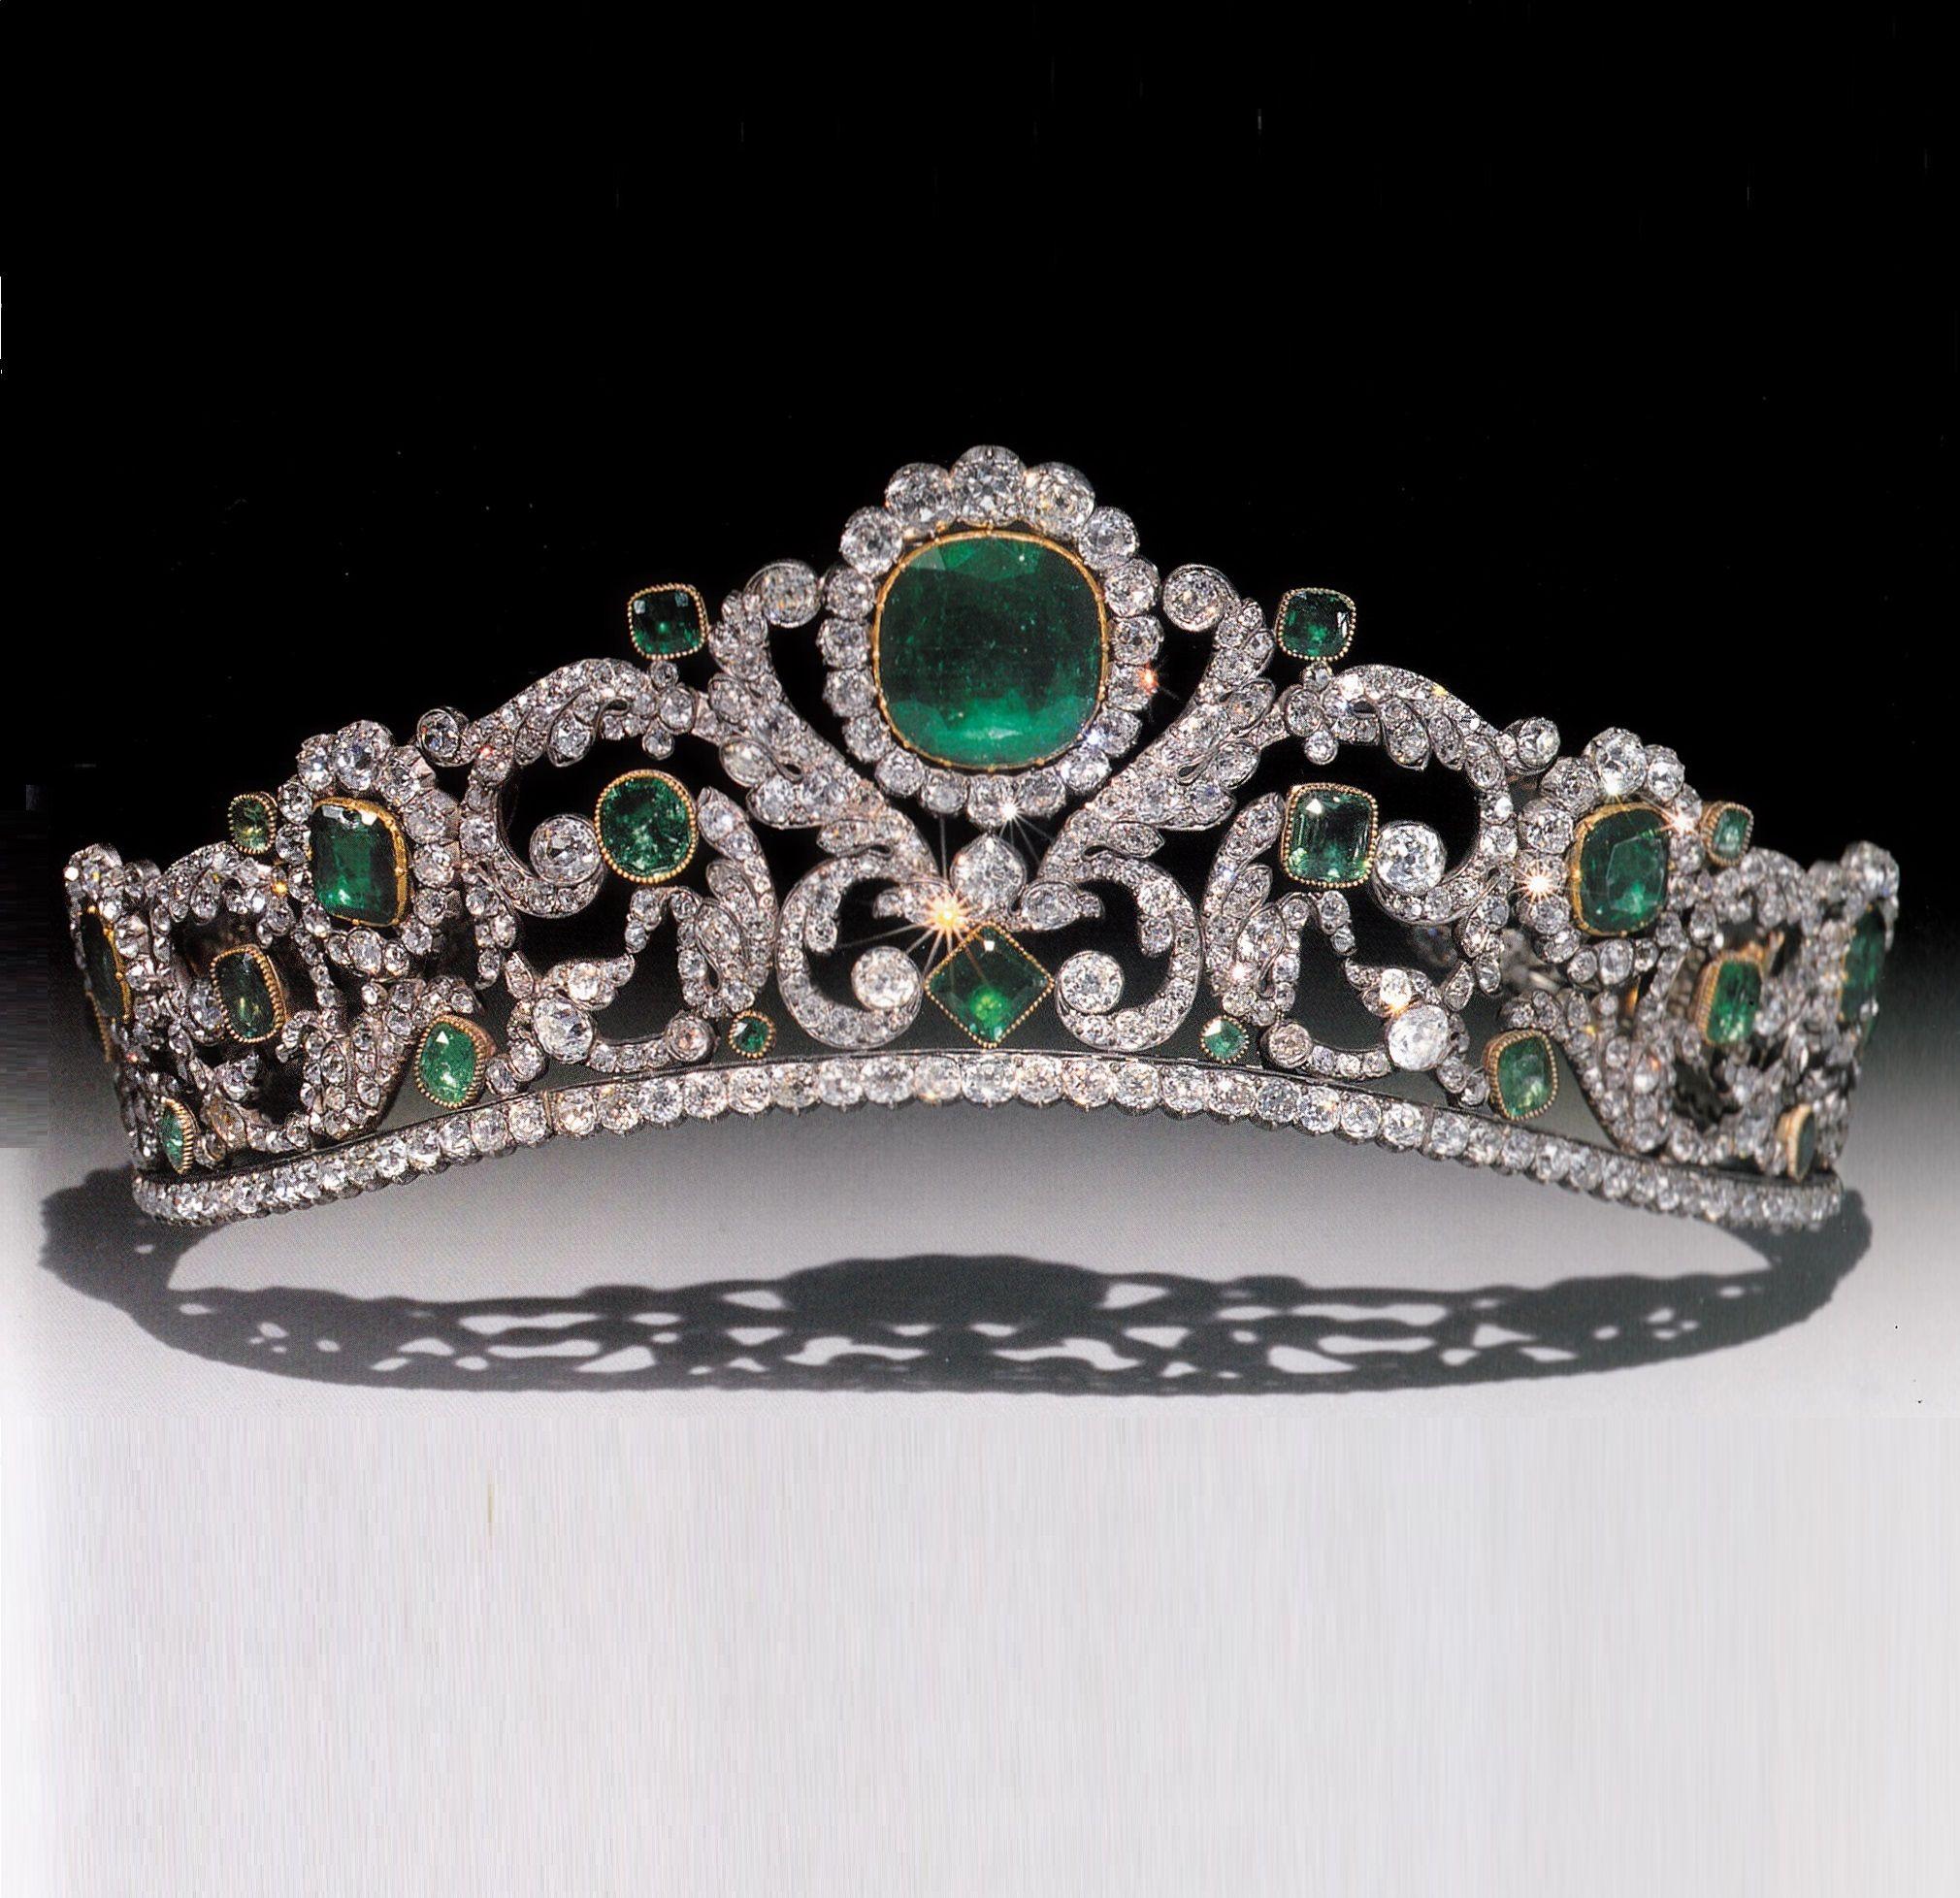 An antique emerald and diamond diadem, by Evrard and Frédéric Bapst, circa 1820…